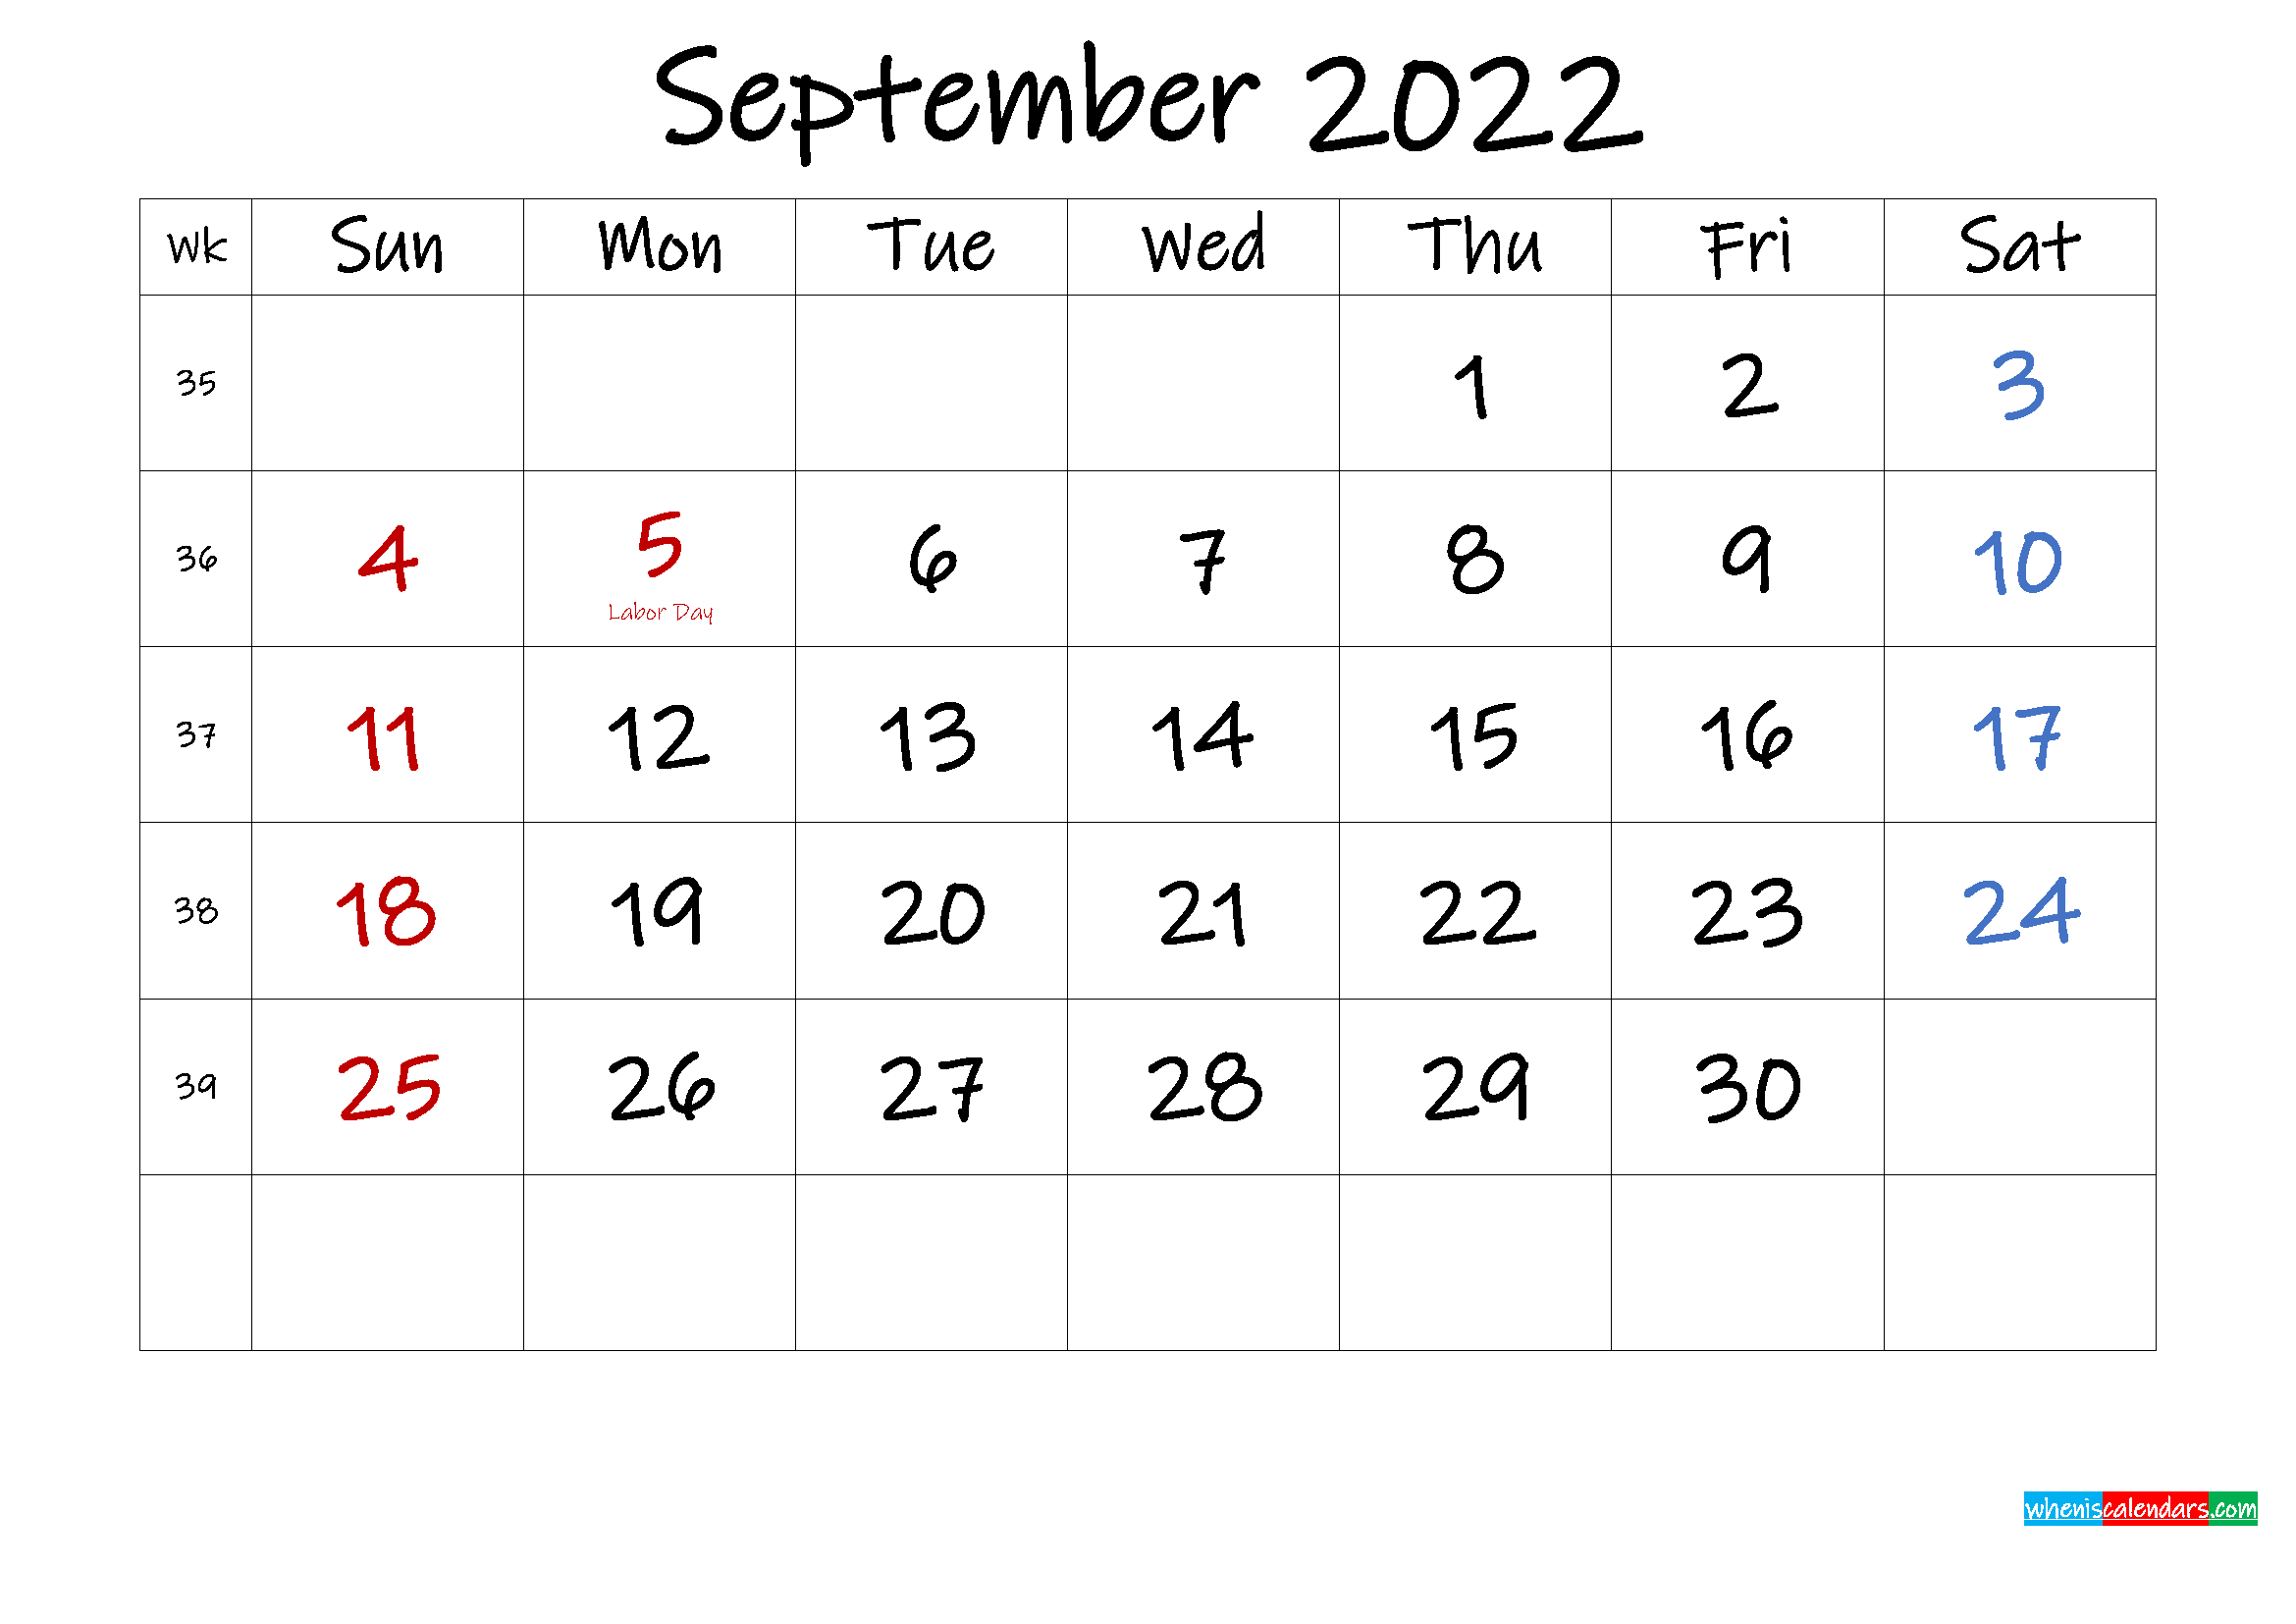 September 2022 Free Printable Calendar With Holidays within September 2022 Calendar Template